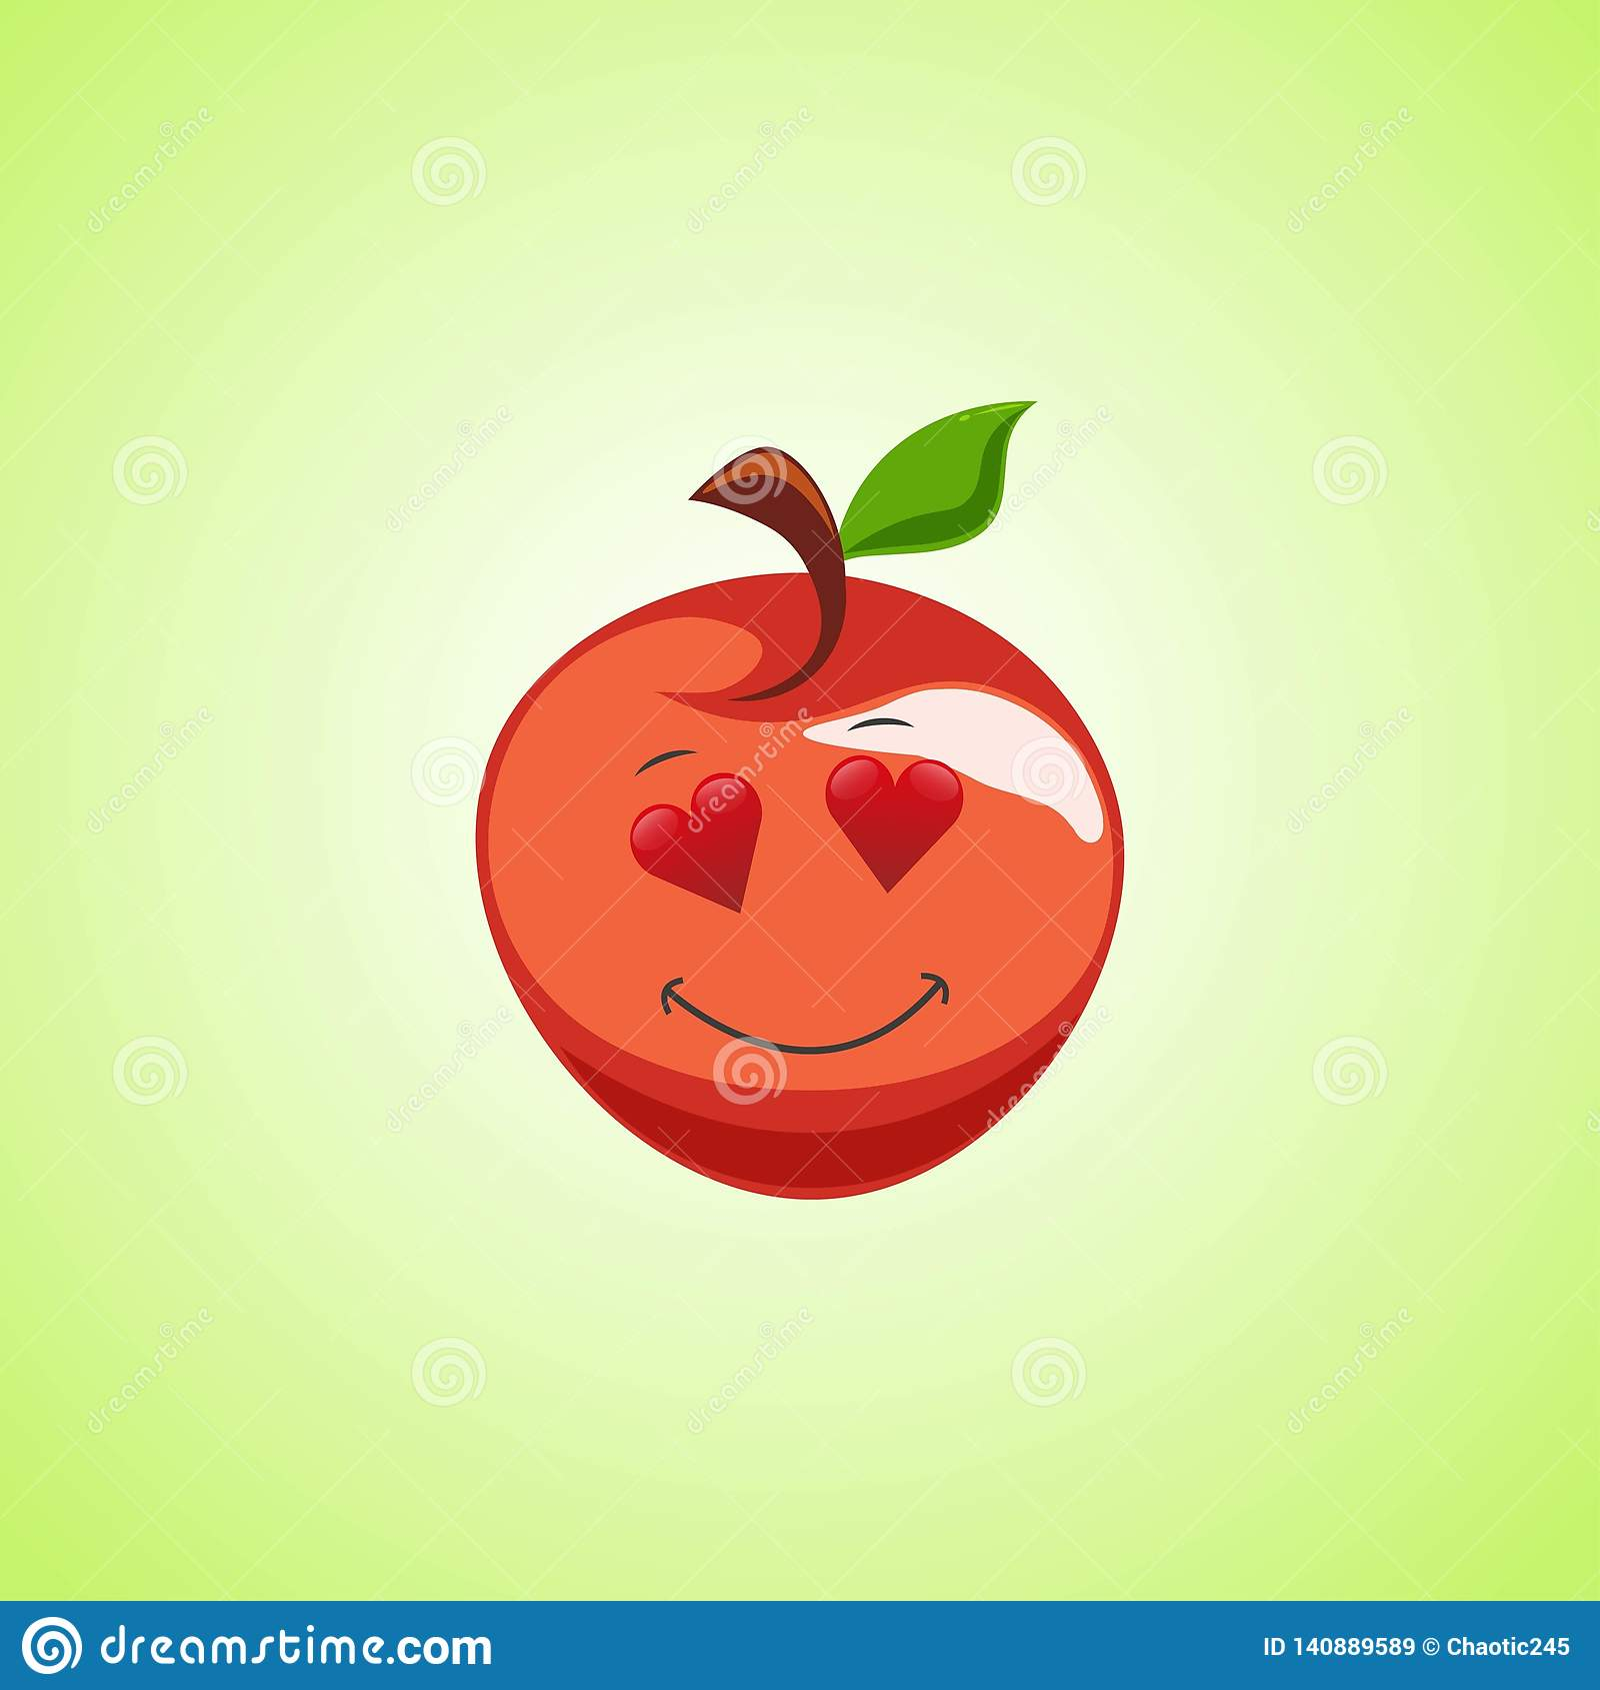 Amorous Pics amorous cartoon red apple symbol. cute smiling apple icon